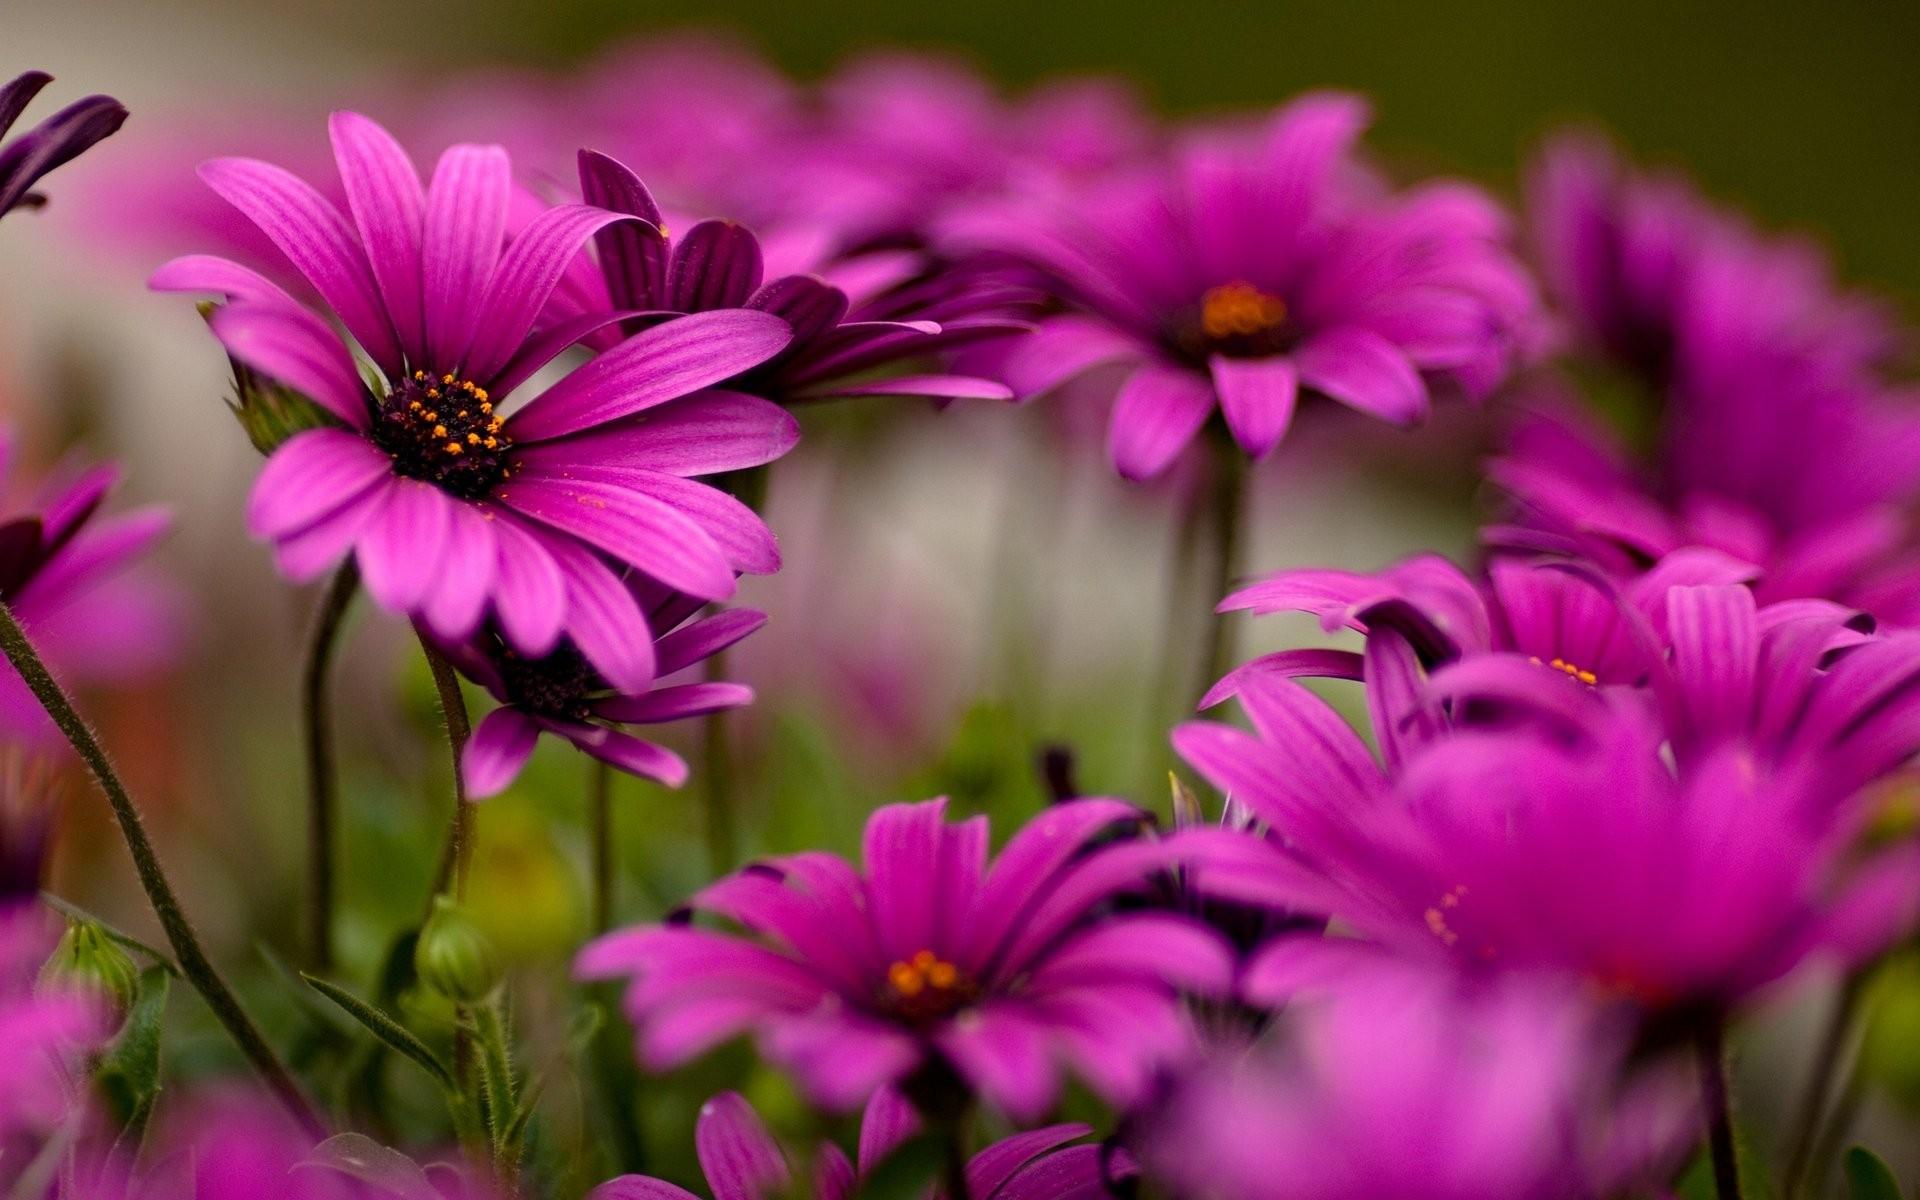 Картинки на телефон цветы, теще днем матери